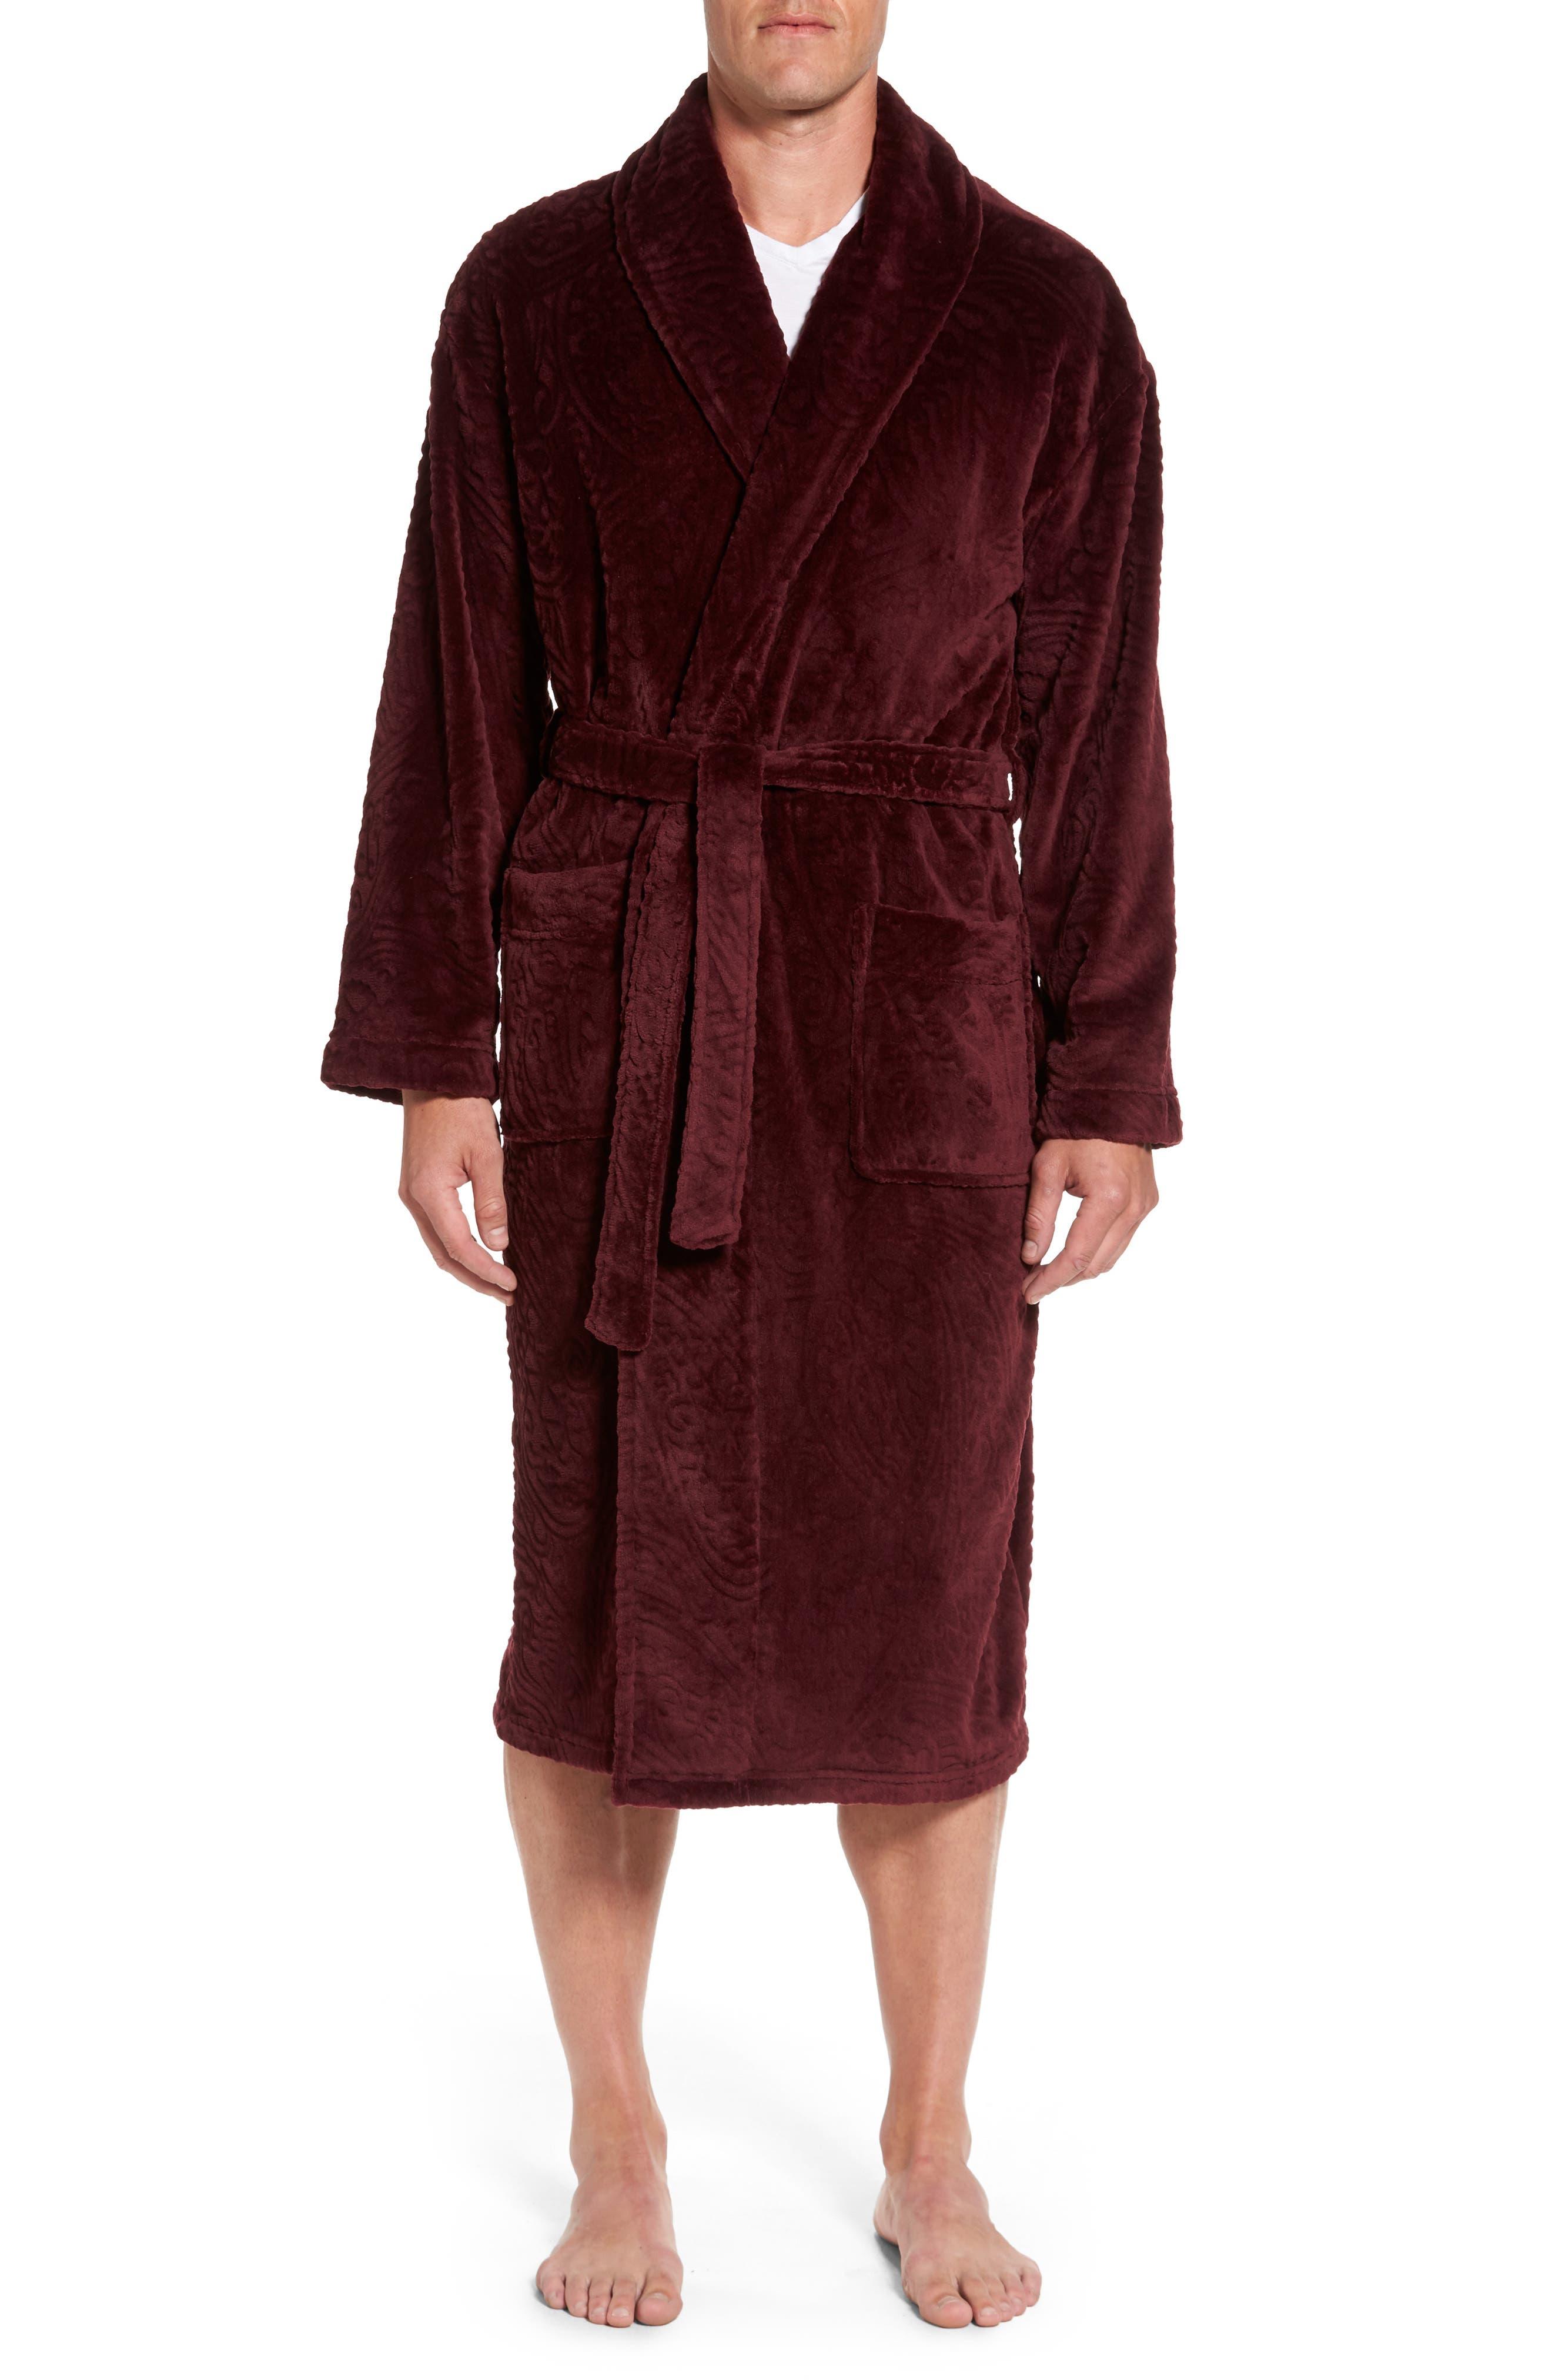 Midtown Robe,                         Main,                         color, Burgundy Paisley